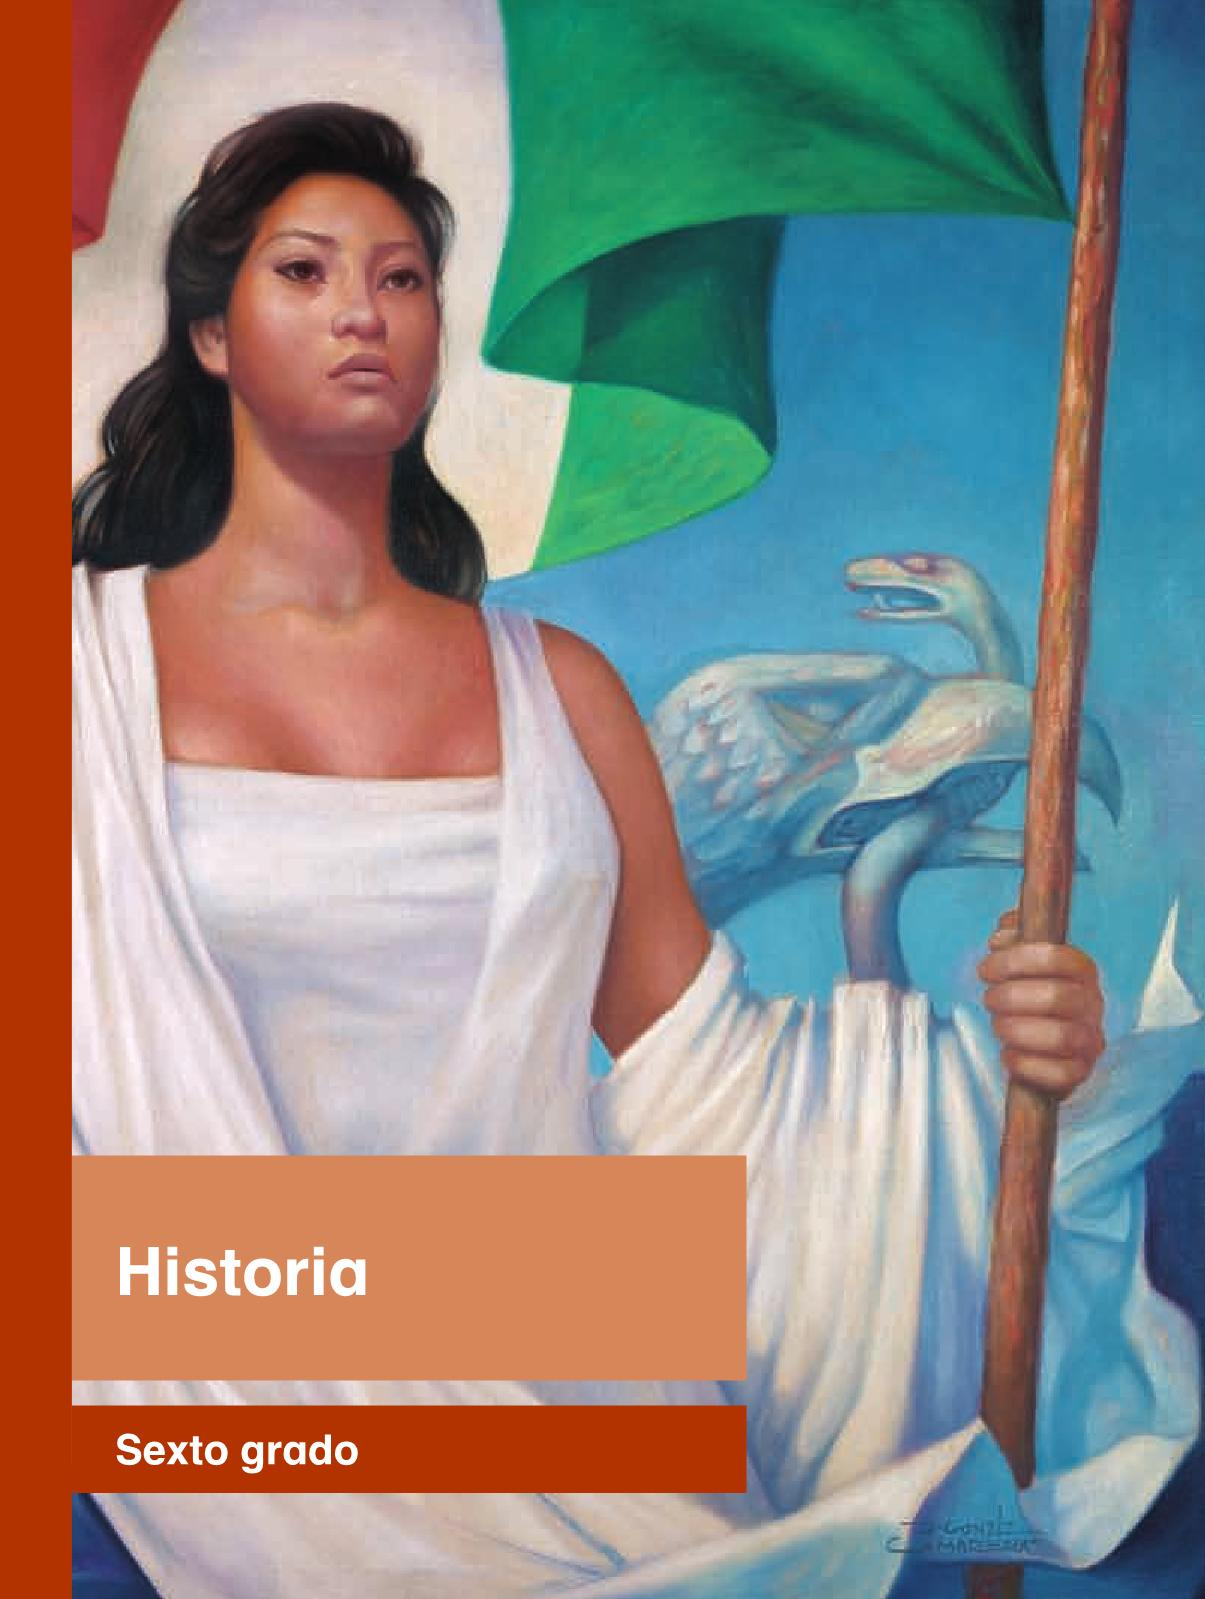 HistoriasextoPagina 1